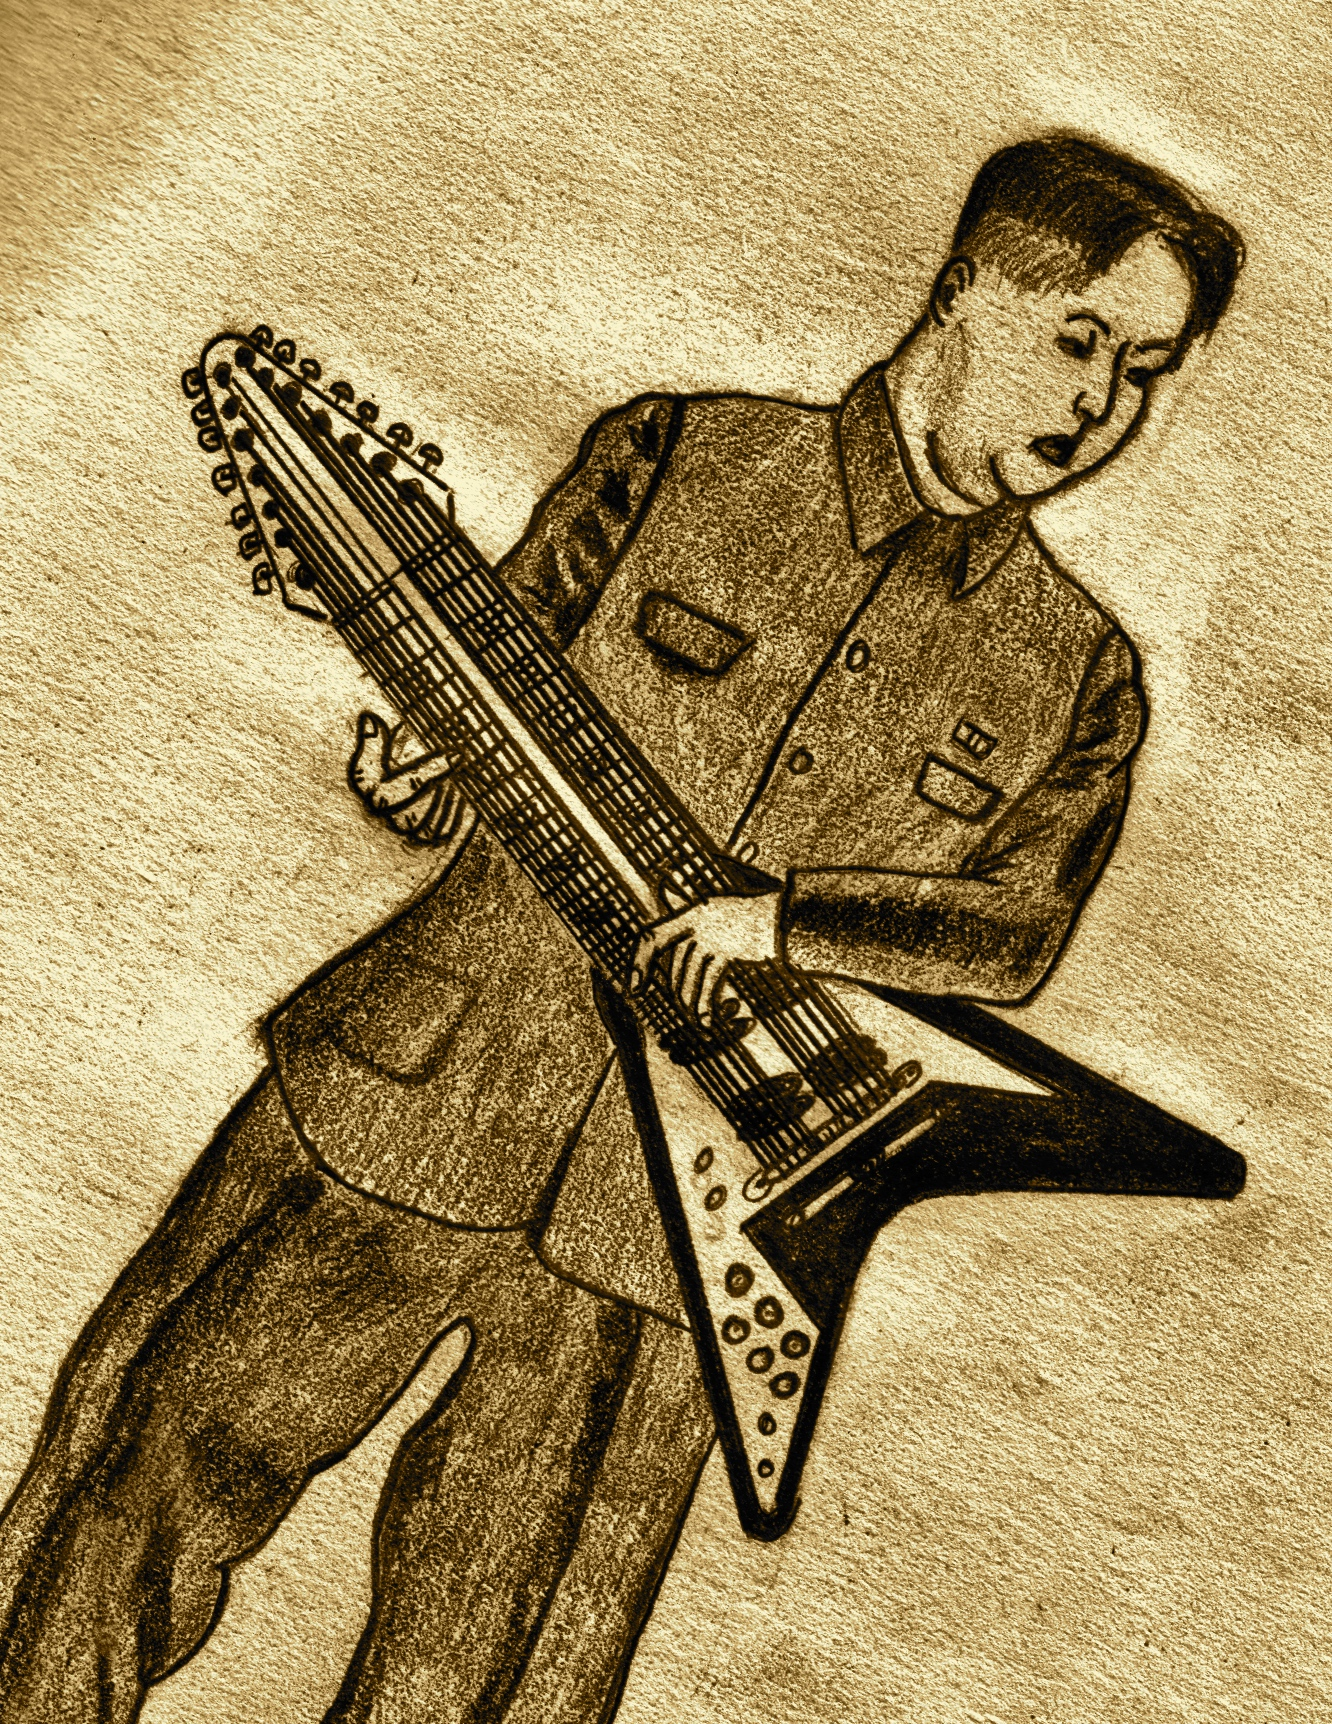 Kim Jong Un Shred